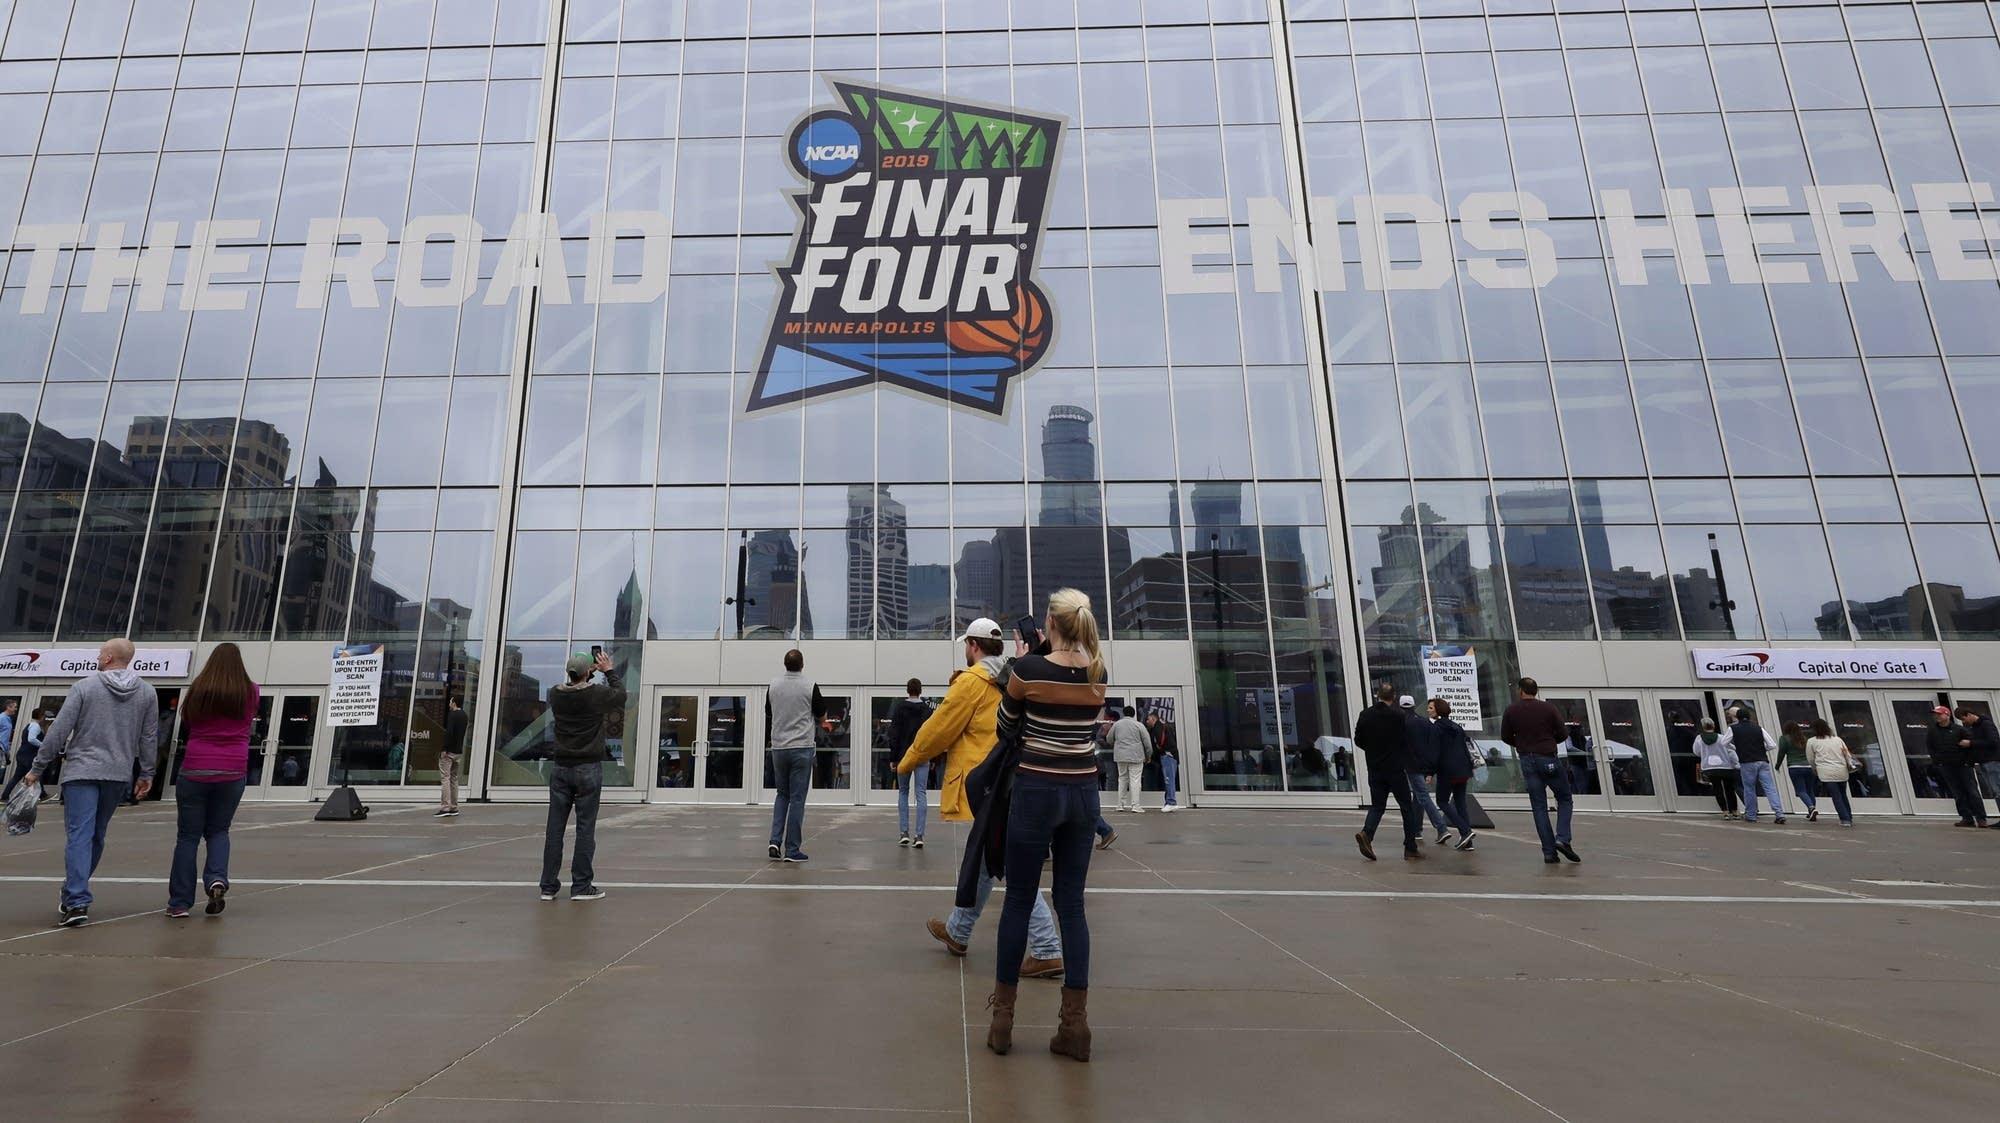 Final Four at U.S. Bank Stadium in Minneapolis